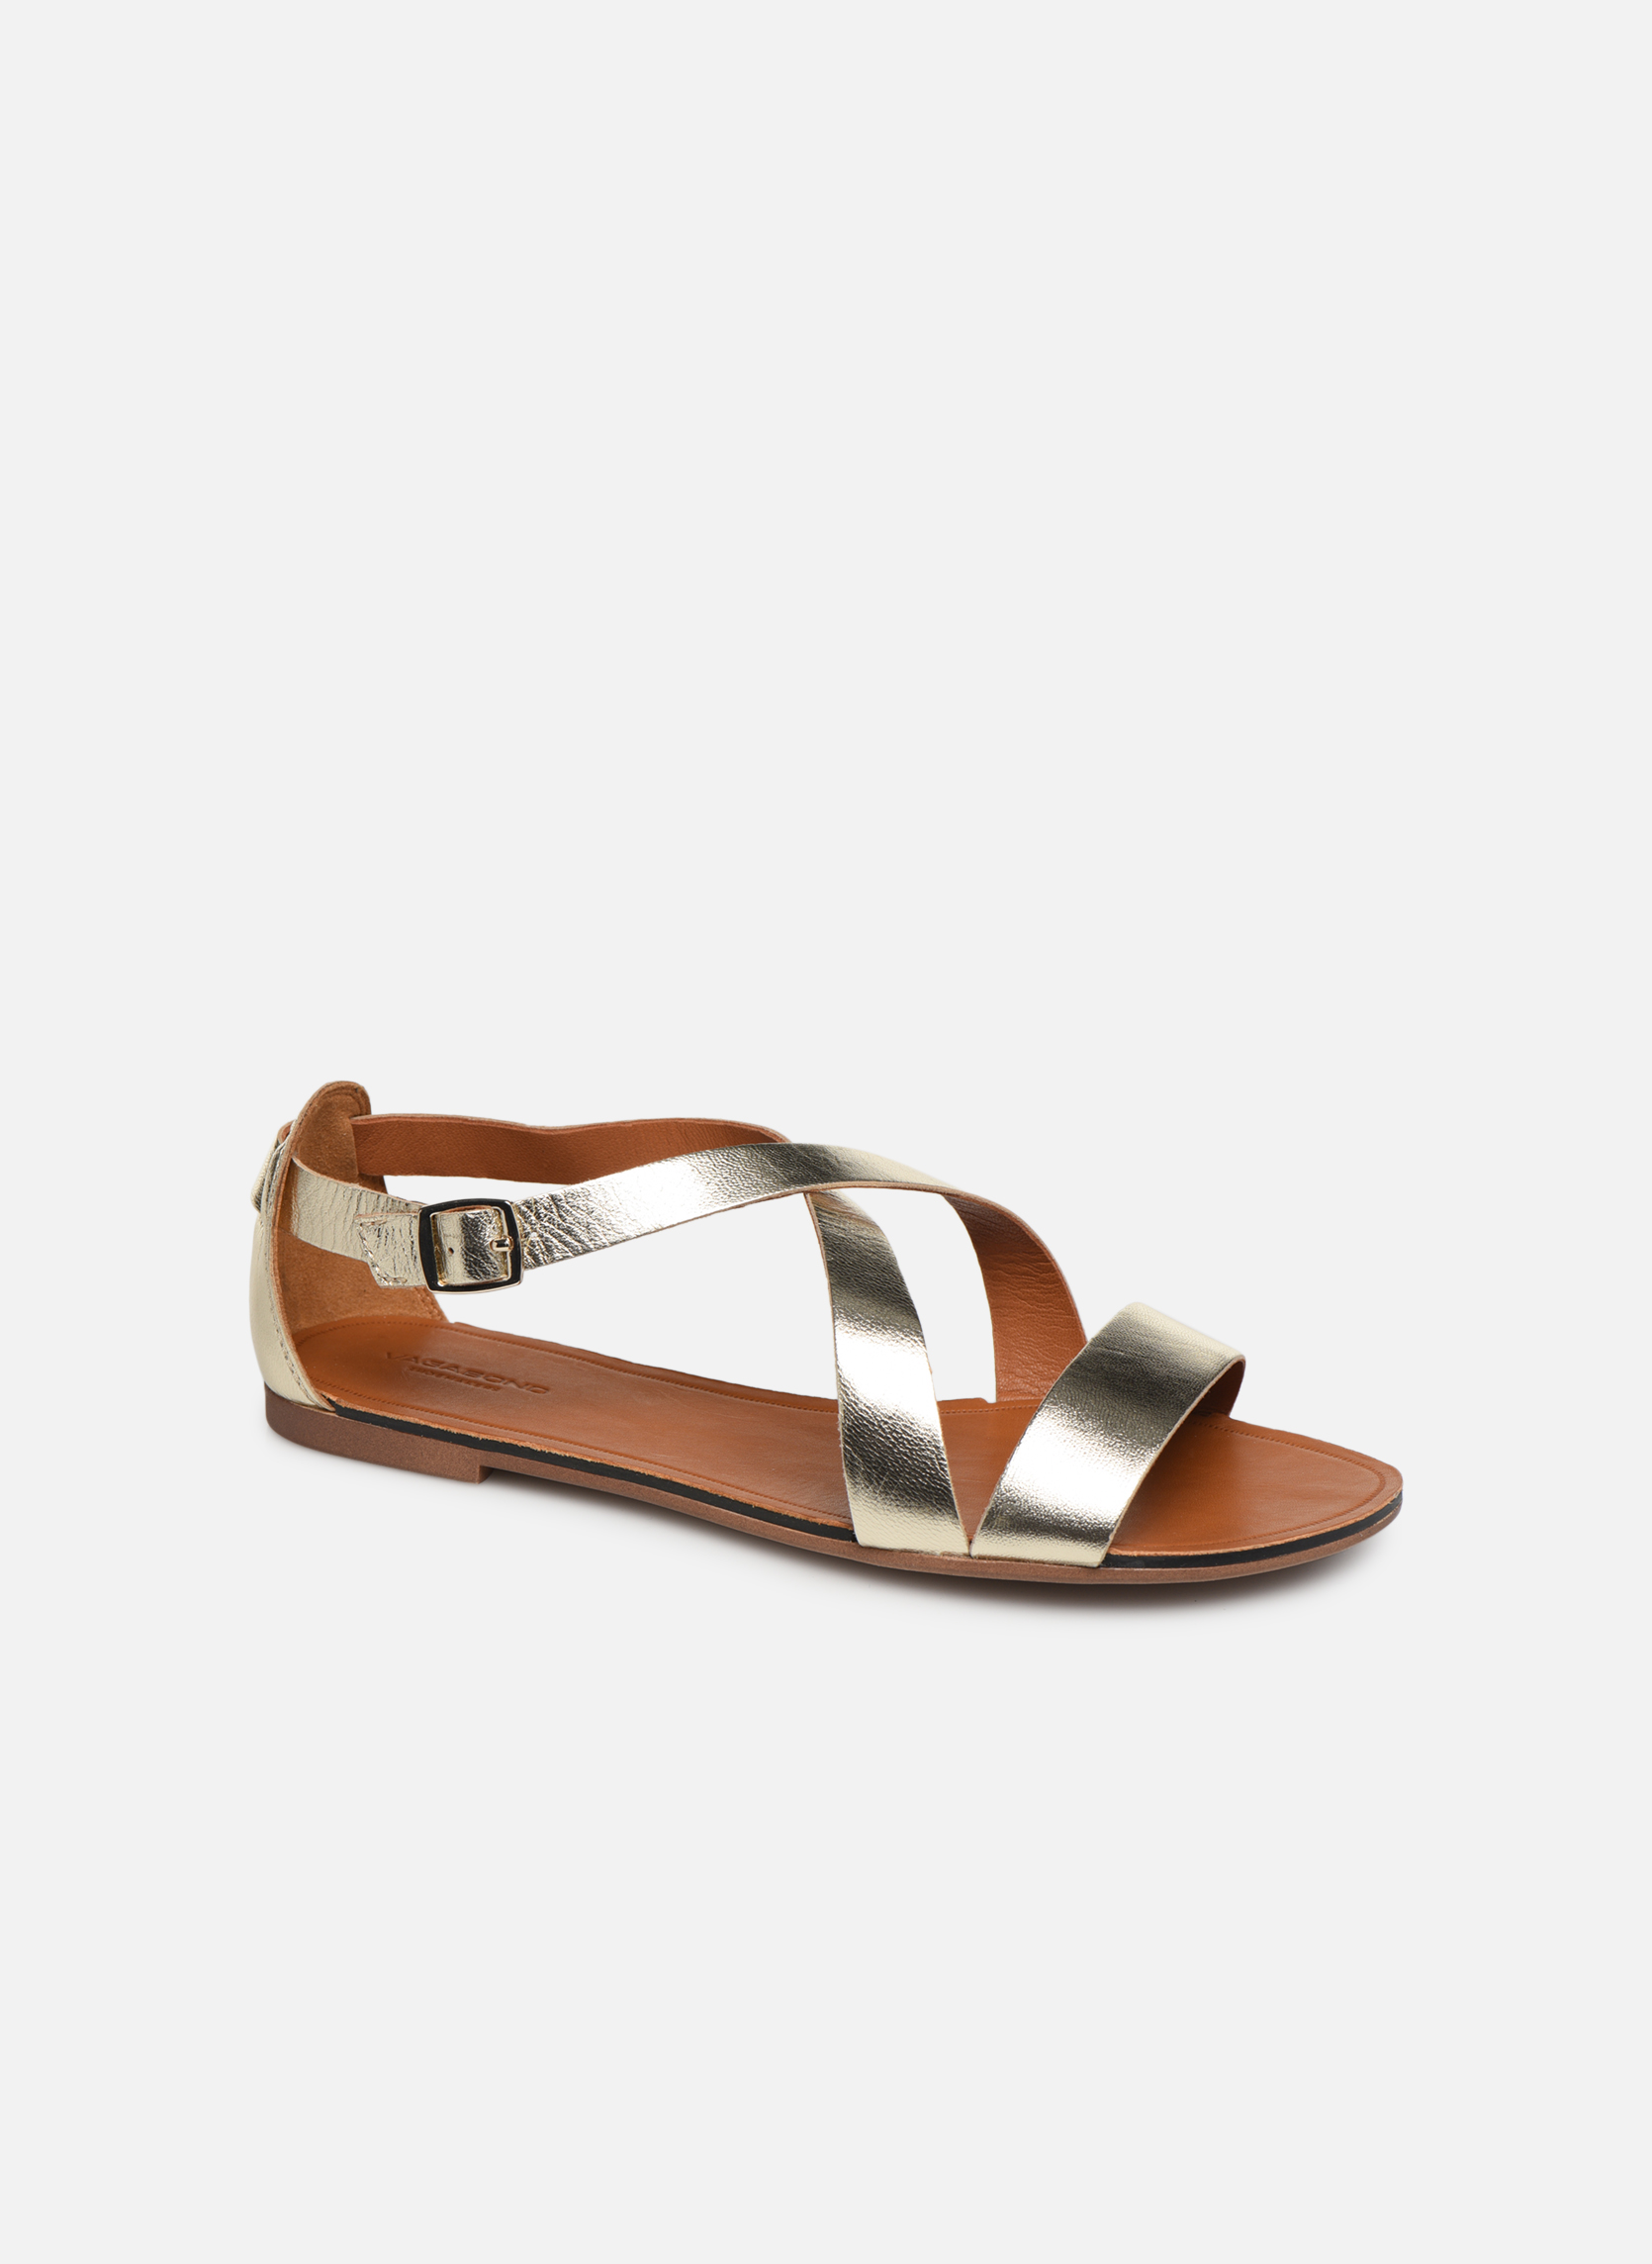 Tia 4531-083 par Vagabond Shoemakers